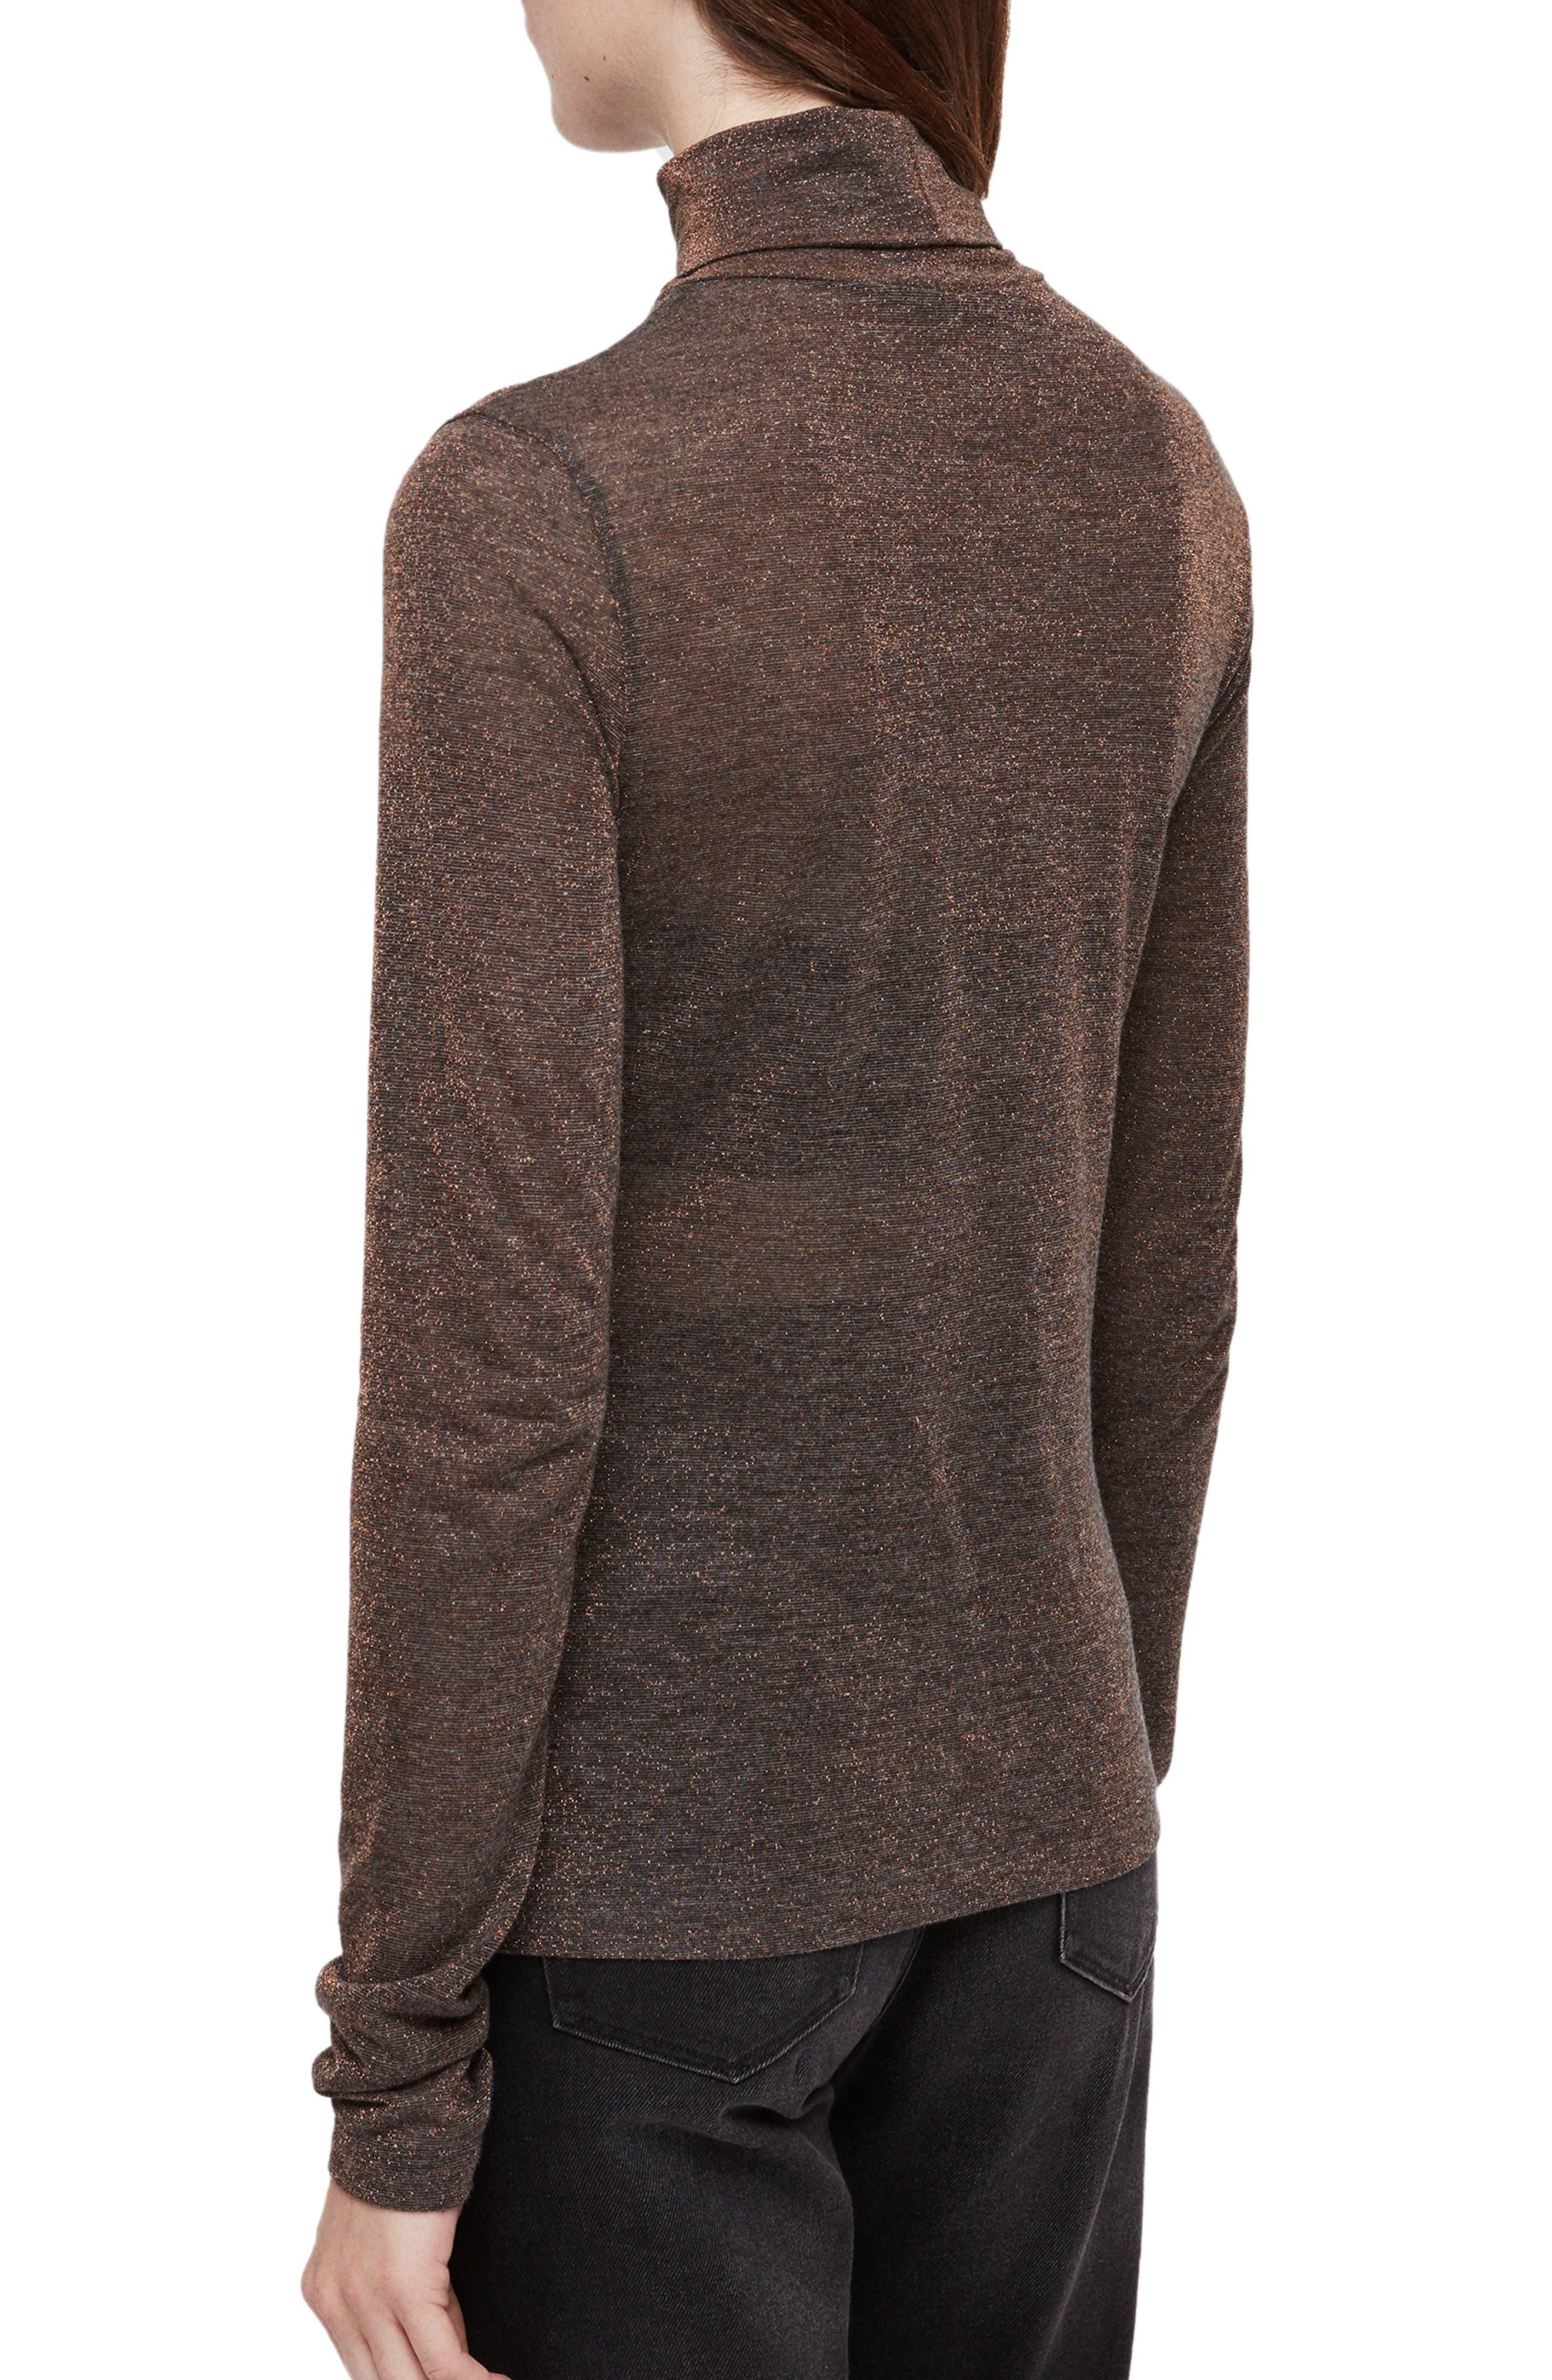 ALLSAINTS, Esme Turtleneck Sweater, Alternate thumbnail 2, color, BLACK